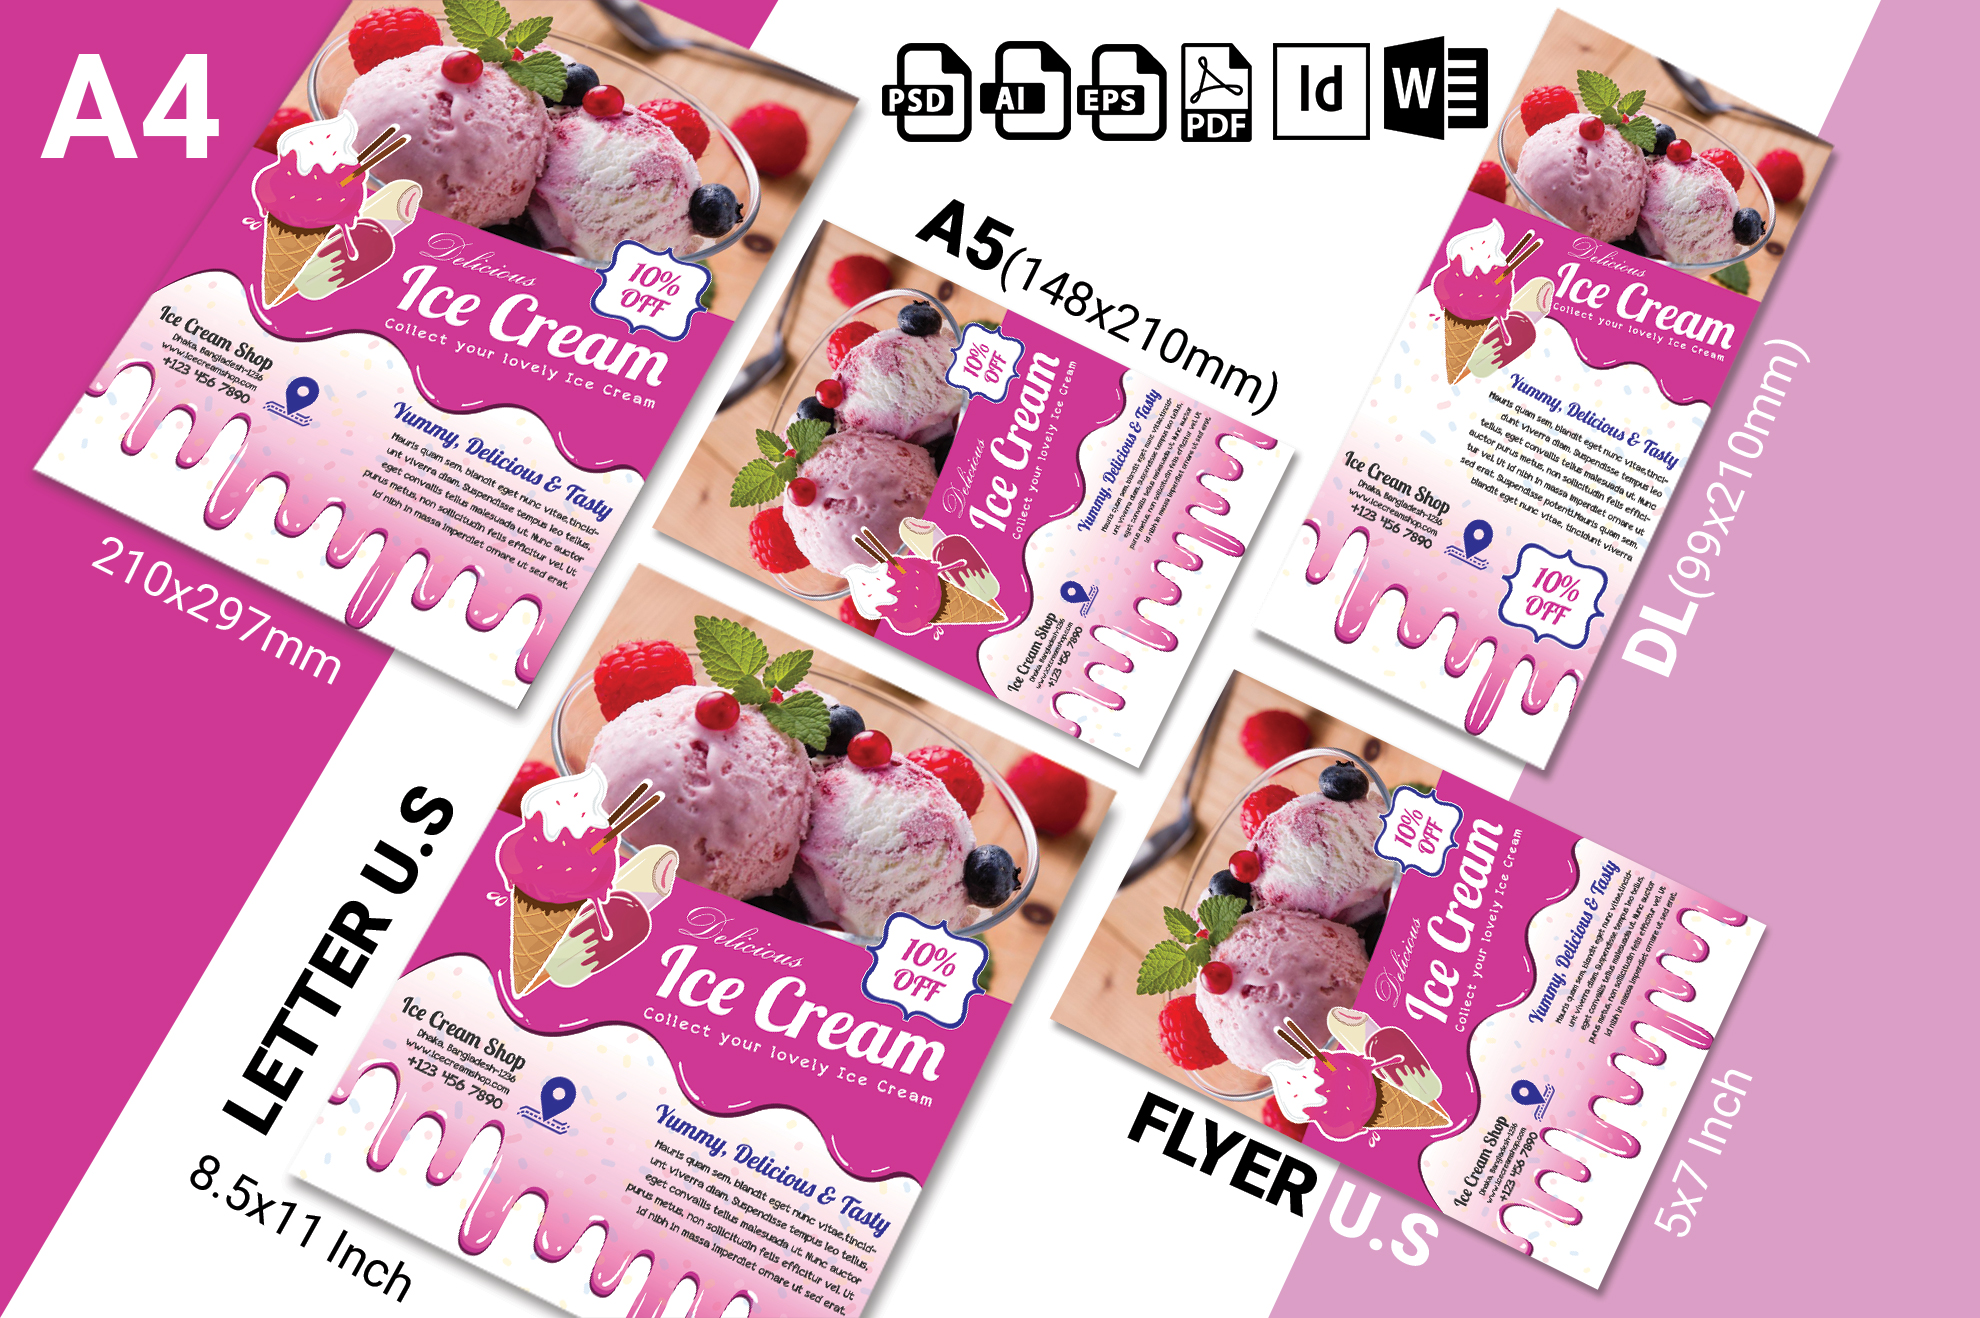 Ice Cream Shop Flyer Template Vol-02 example image 2